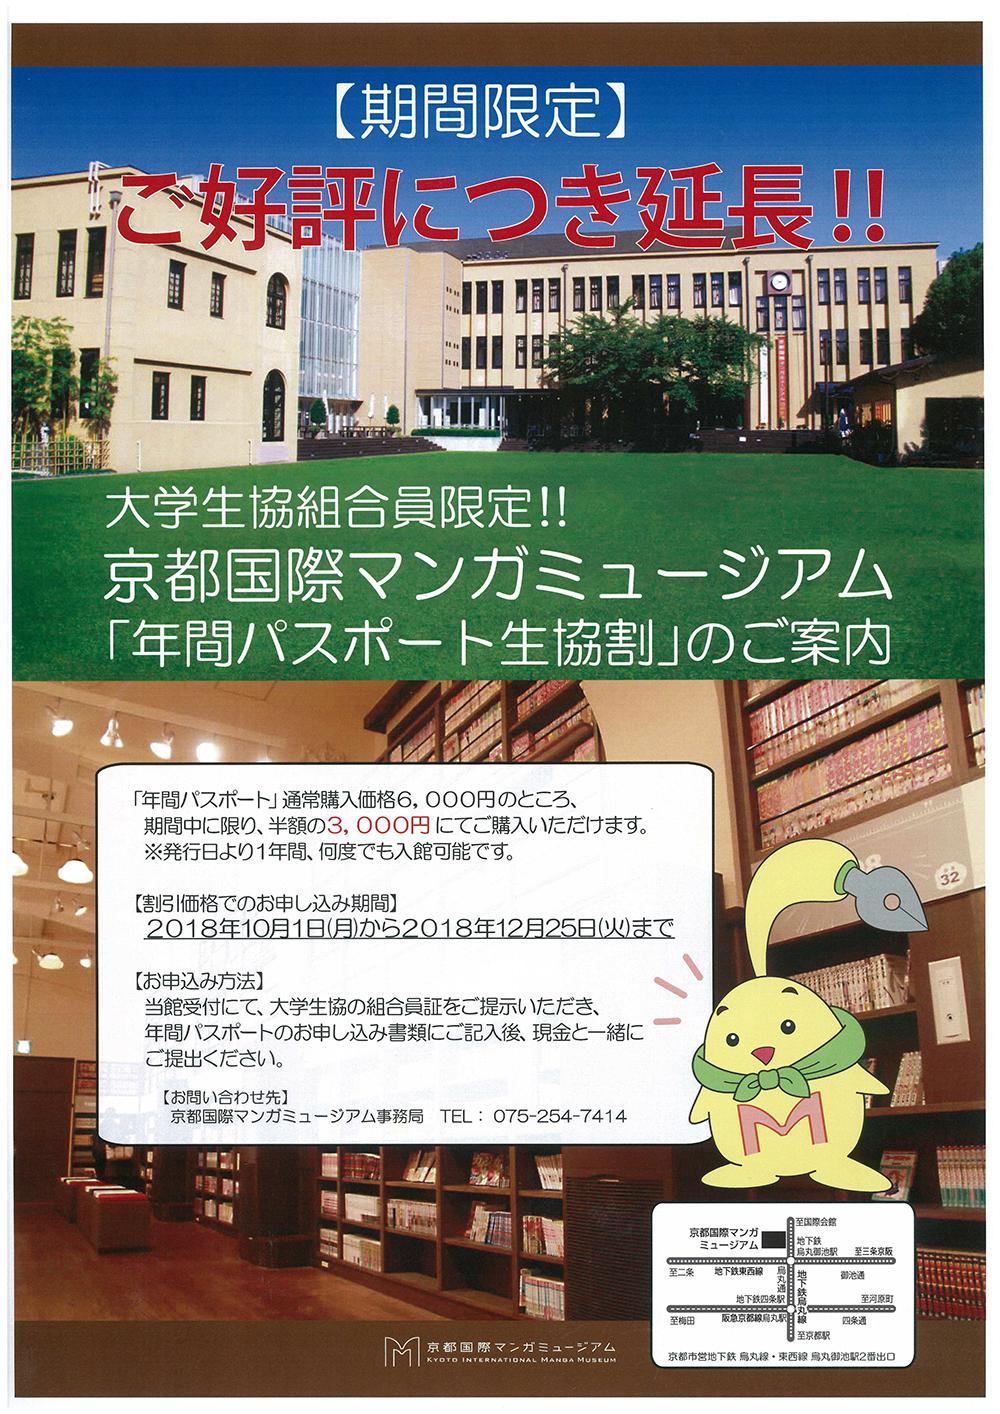 manga_museum.png